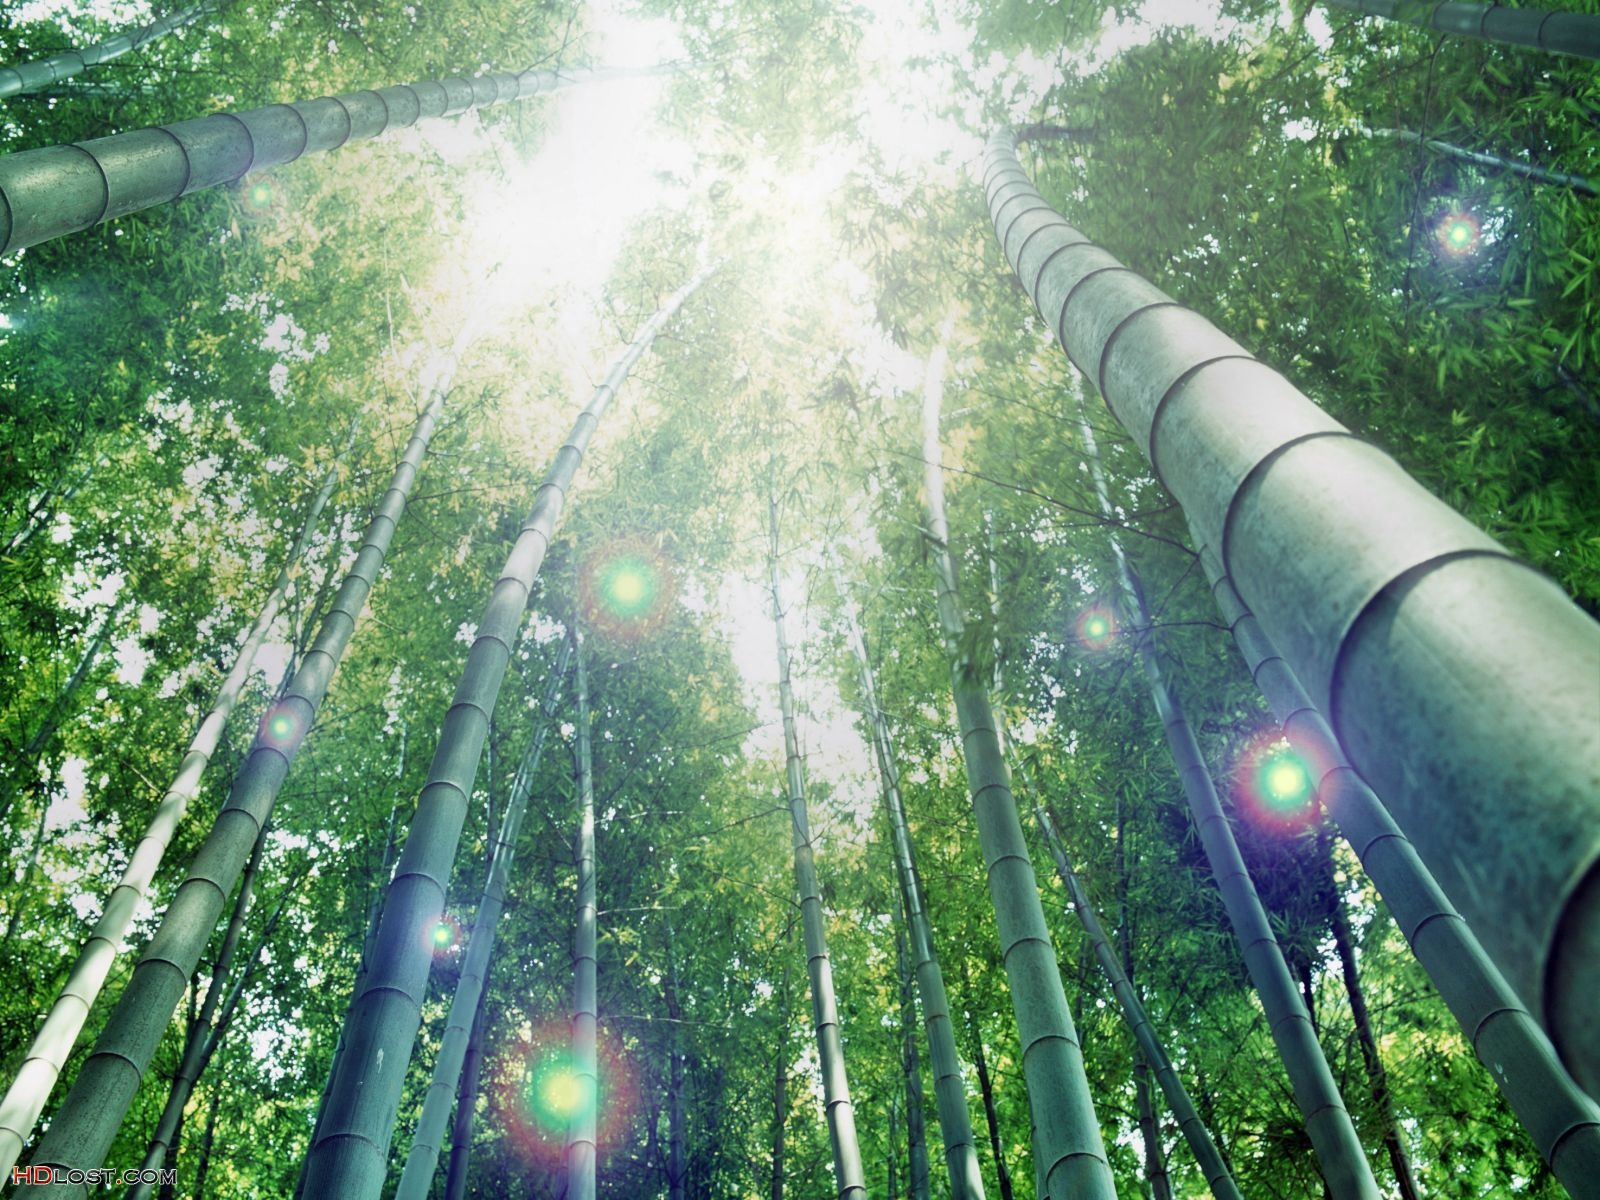 http://3.bp.blogspot.com/-JphF-aQYv14/Tq0d8qXhu3I/AAAAAAAABfM/0LotEhpcDJY/s1600/windows-7-backgrounds-bamboo-forest-1600x1200.jpg